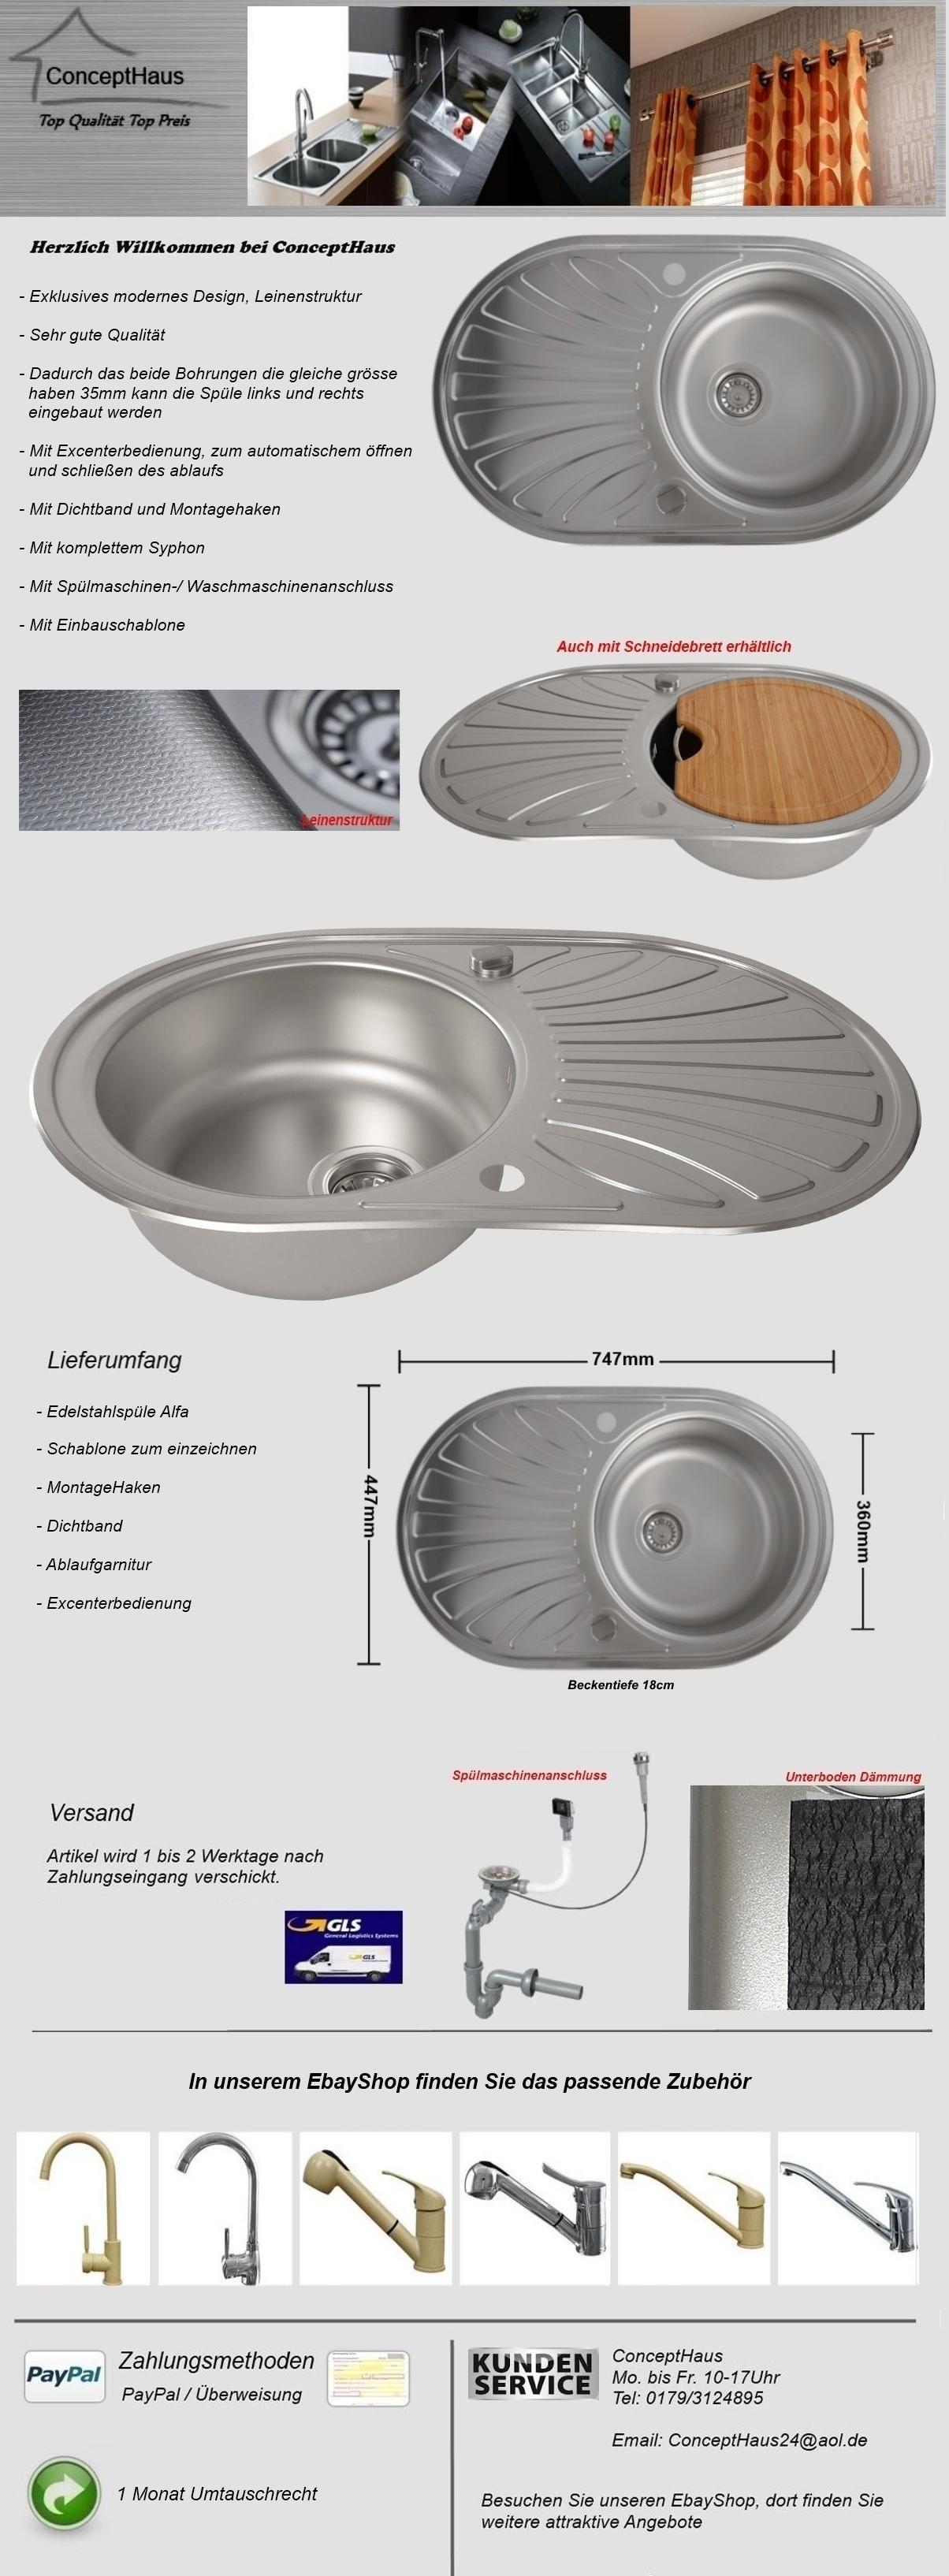 Edelstahlspüle LEINENSTRUKTUR Küchenspüle Einbauspüle  ~ Spülbecken Oval